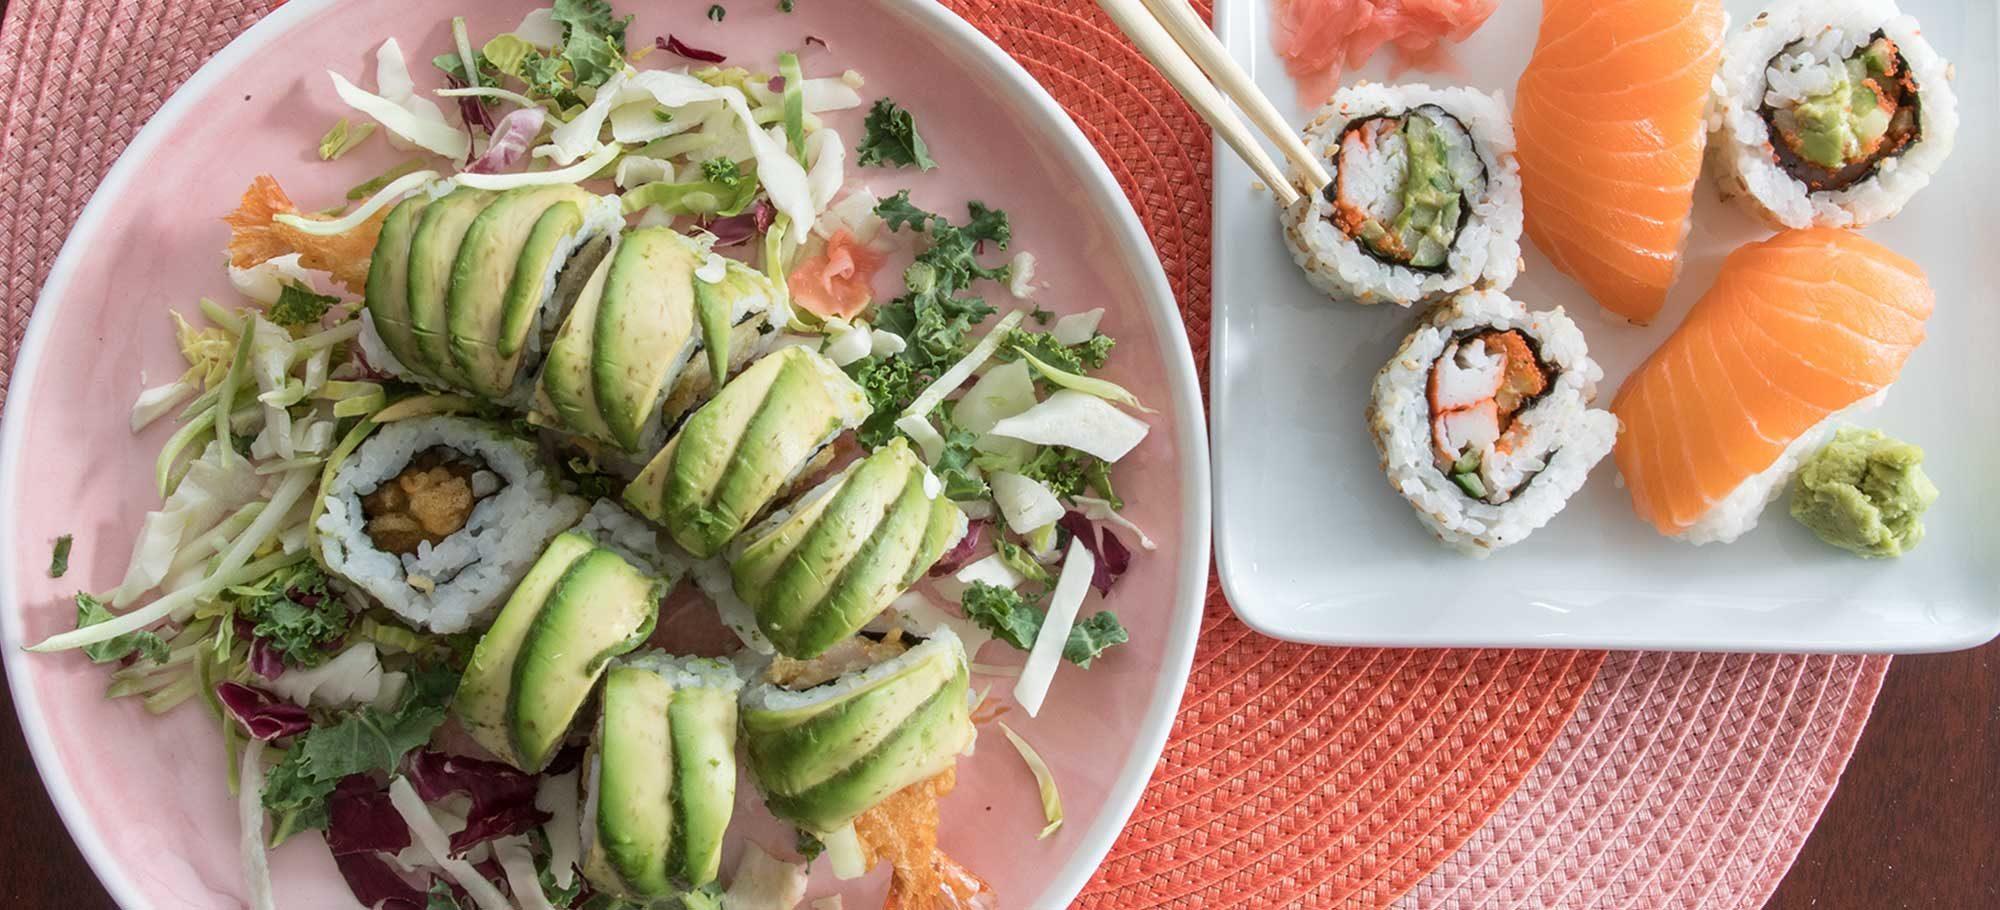 Food Sushi Frangon Roll